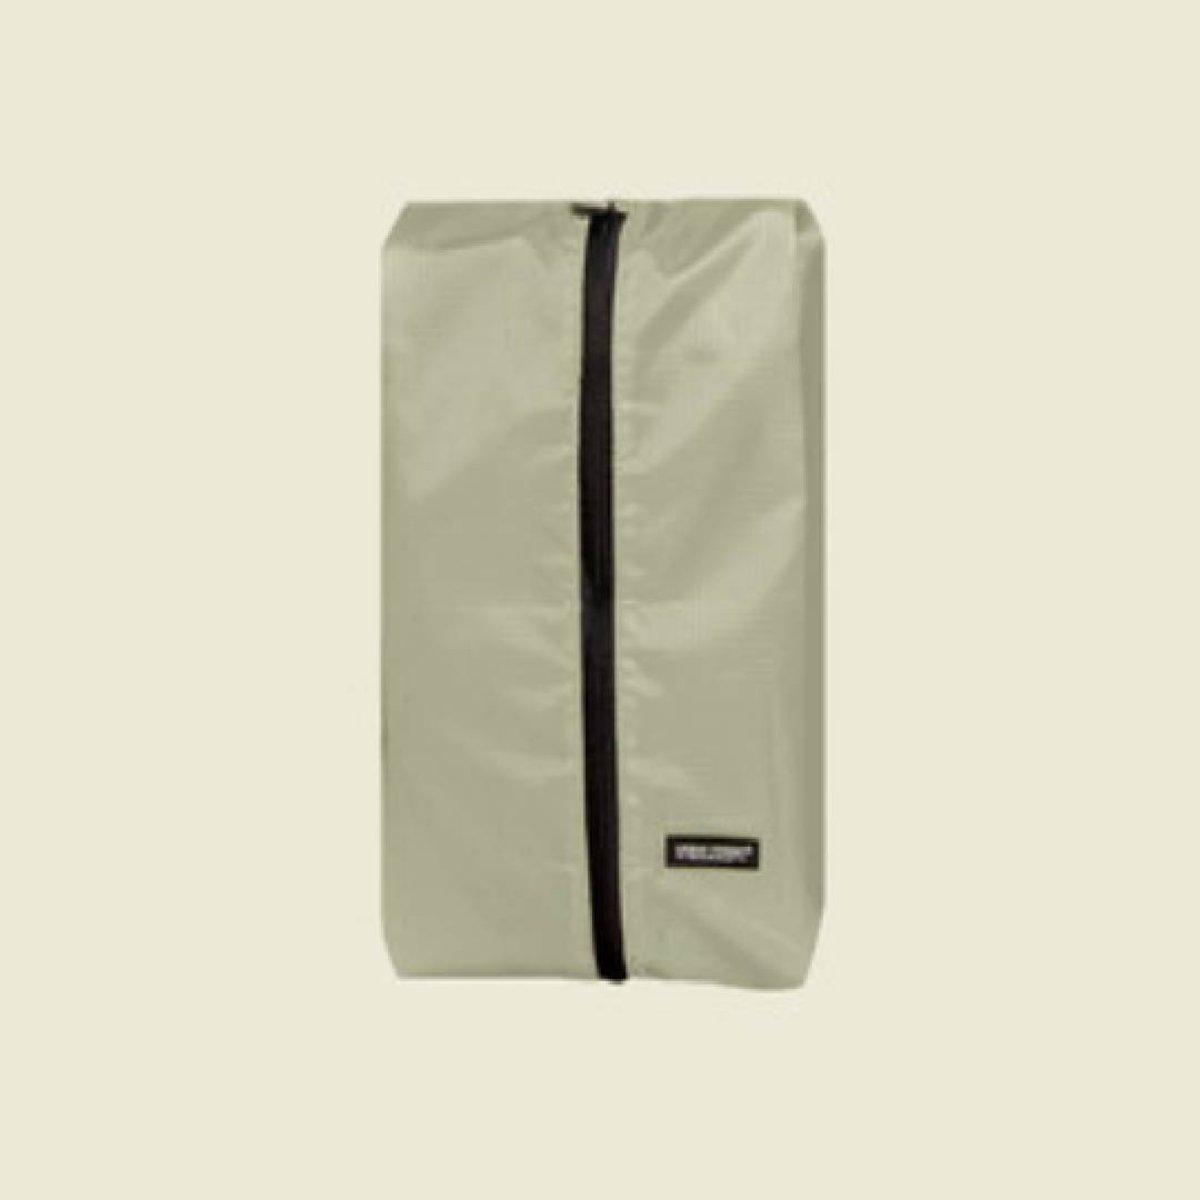 SPACE BAG FOR LUGGAGE STORAGE TRAVEL BAG - Khaki